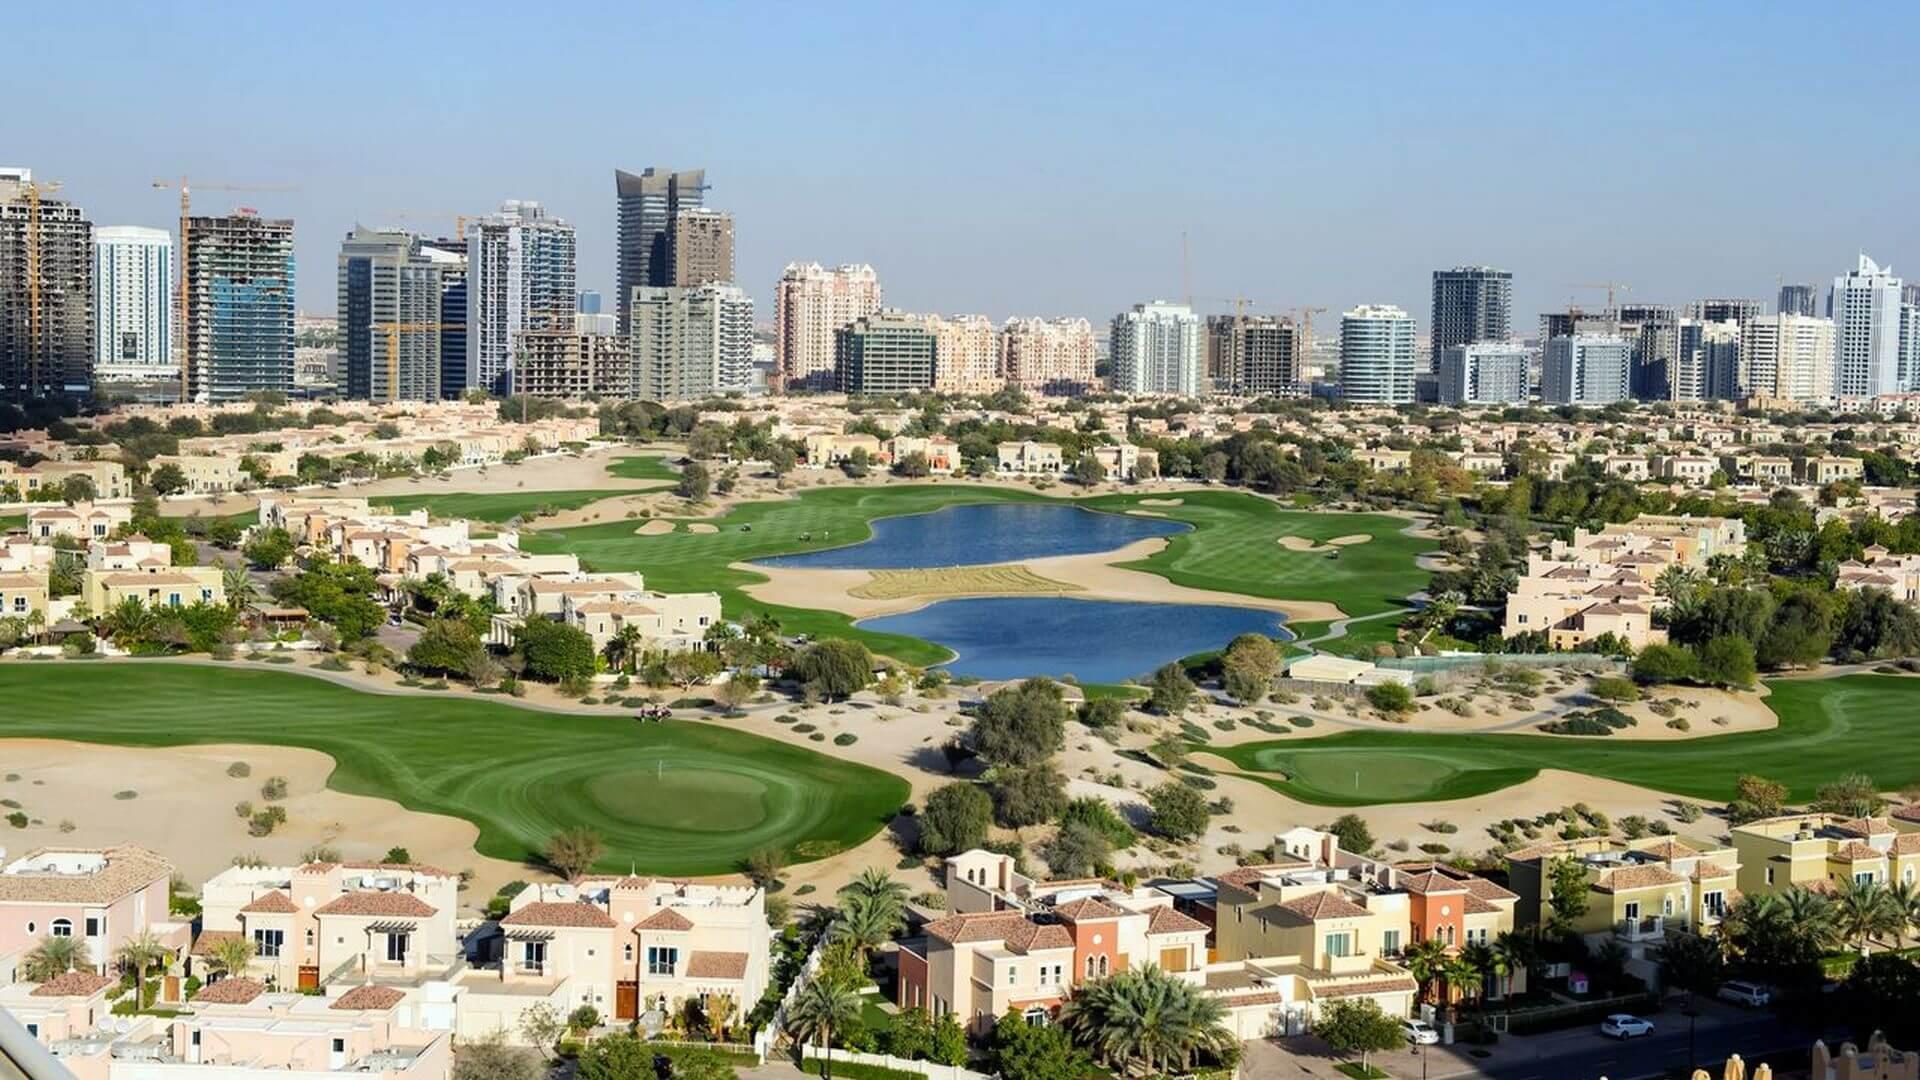 Ciudad Deportiva de Dubai - 12